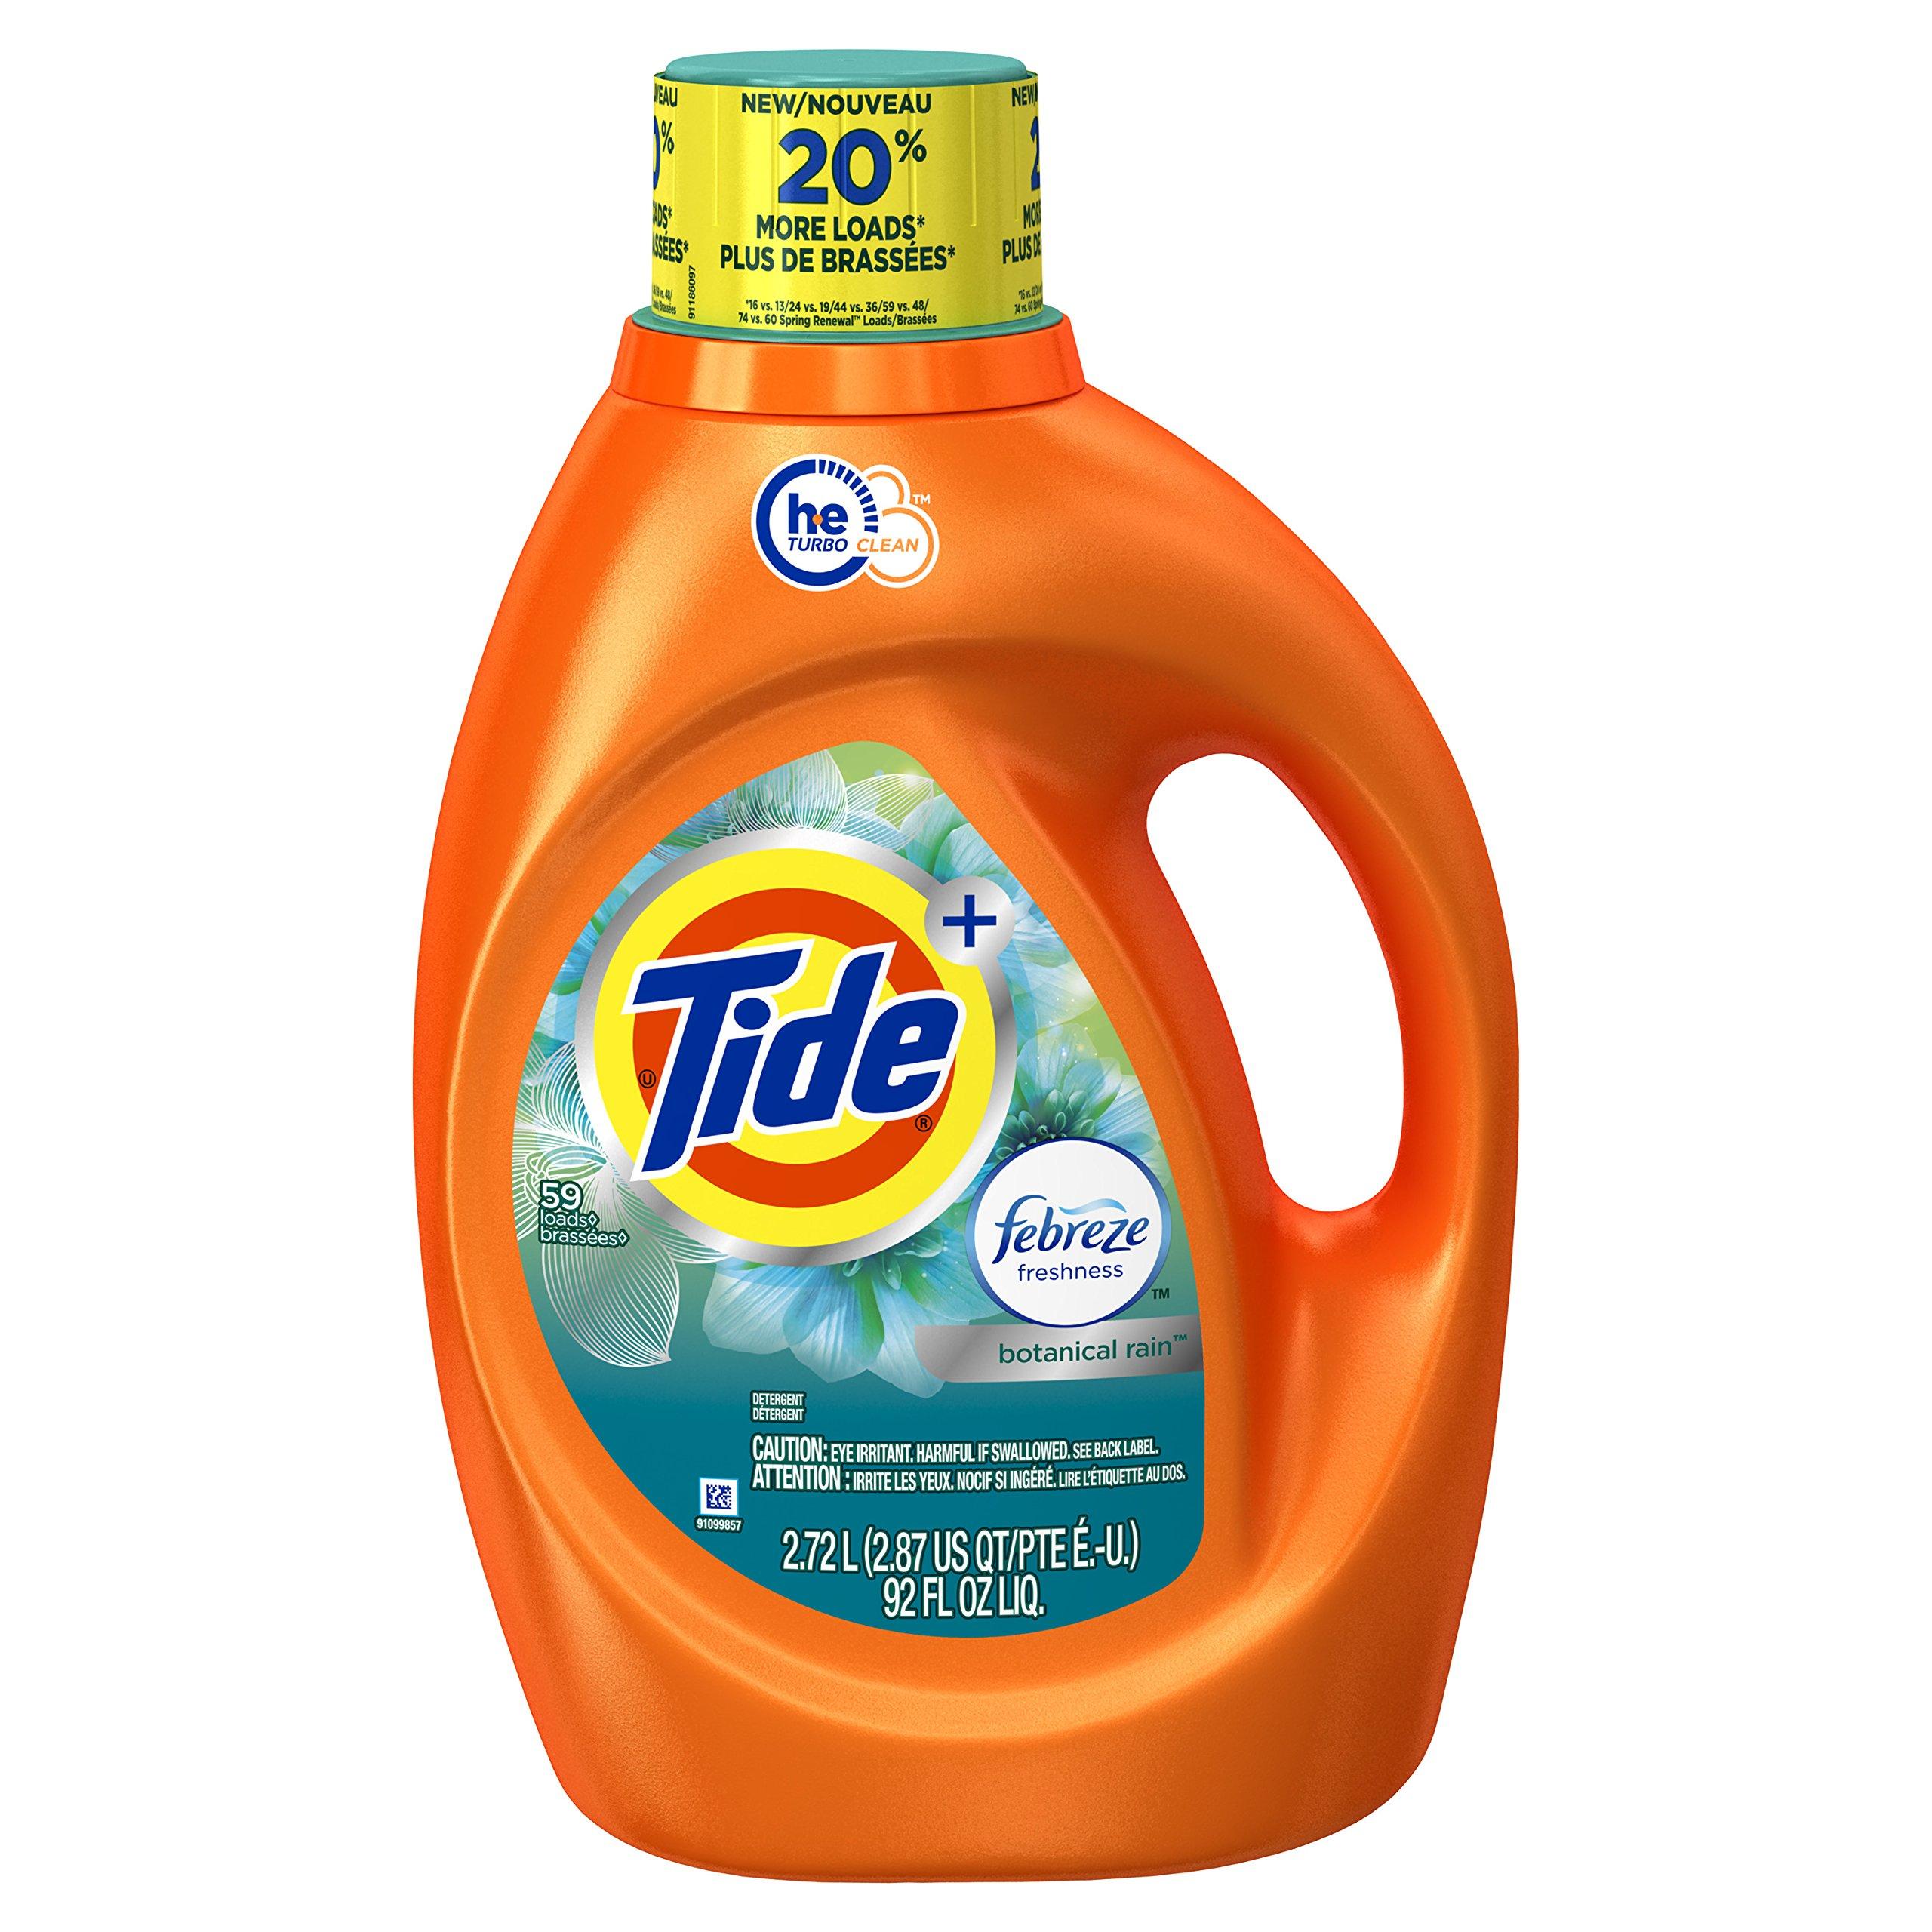 Tide 59 Loads Plus Febreze Freshness Botanical Rain He Turbo Clean Liquid Laundry Detergent, 92 Fluid Ounce  (Packaging May Vary)